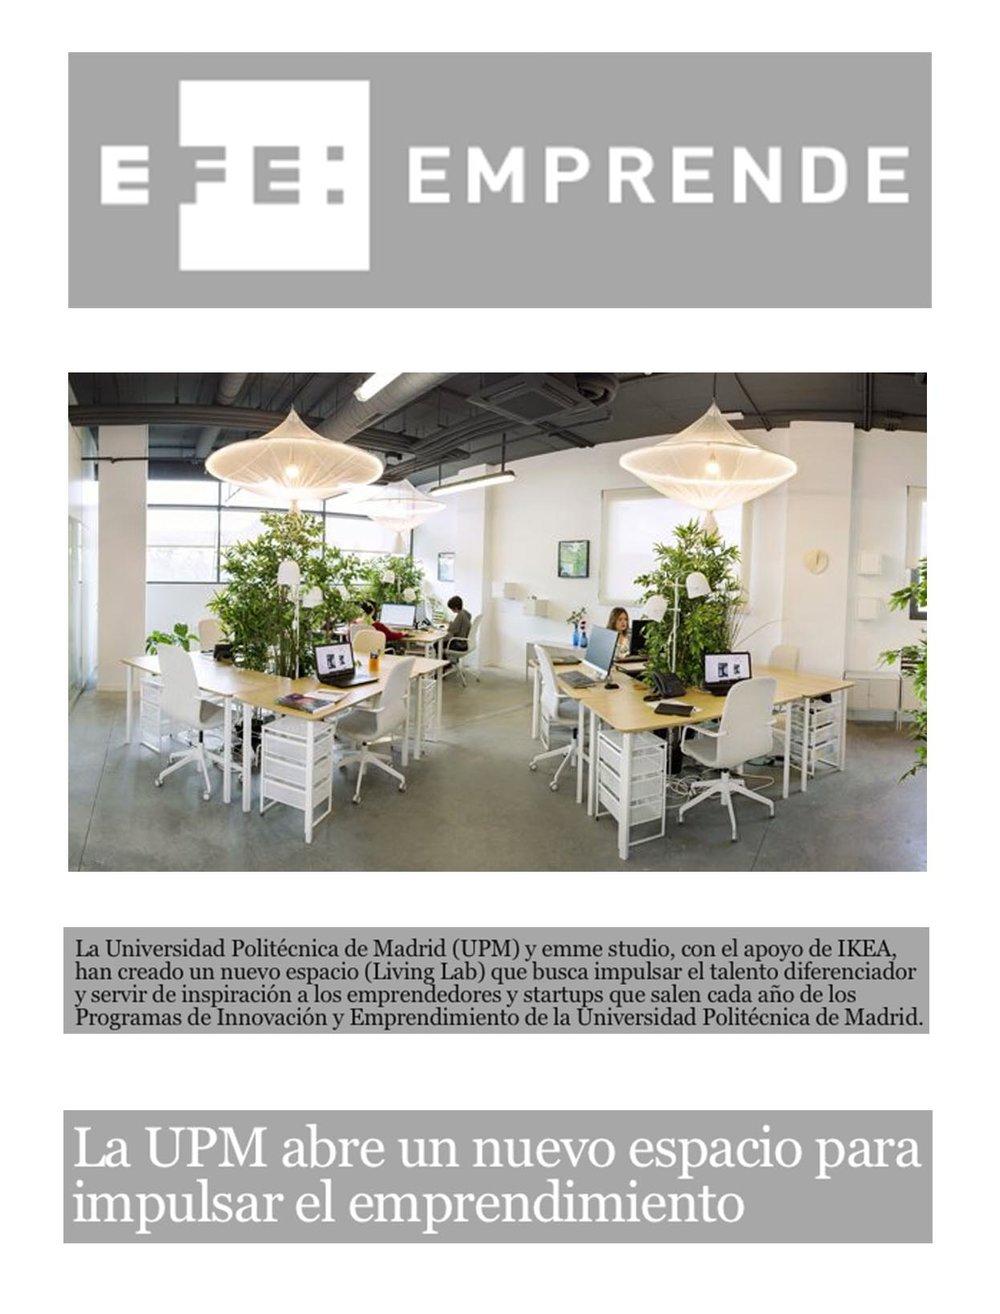 emmme studio efe emprende reformas diseño slow prensa living lab.jpg